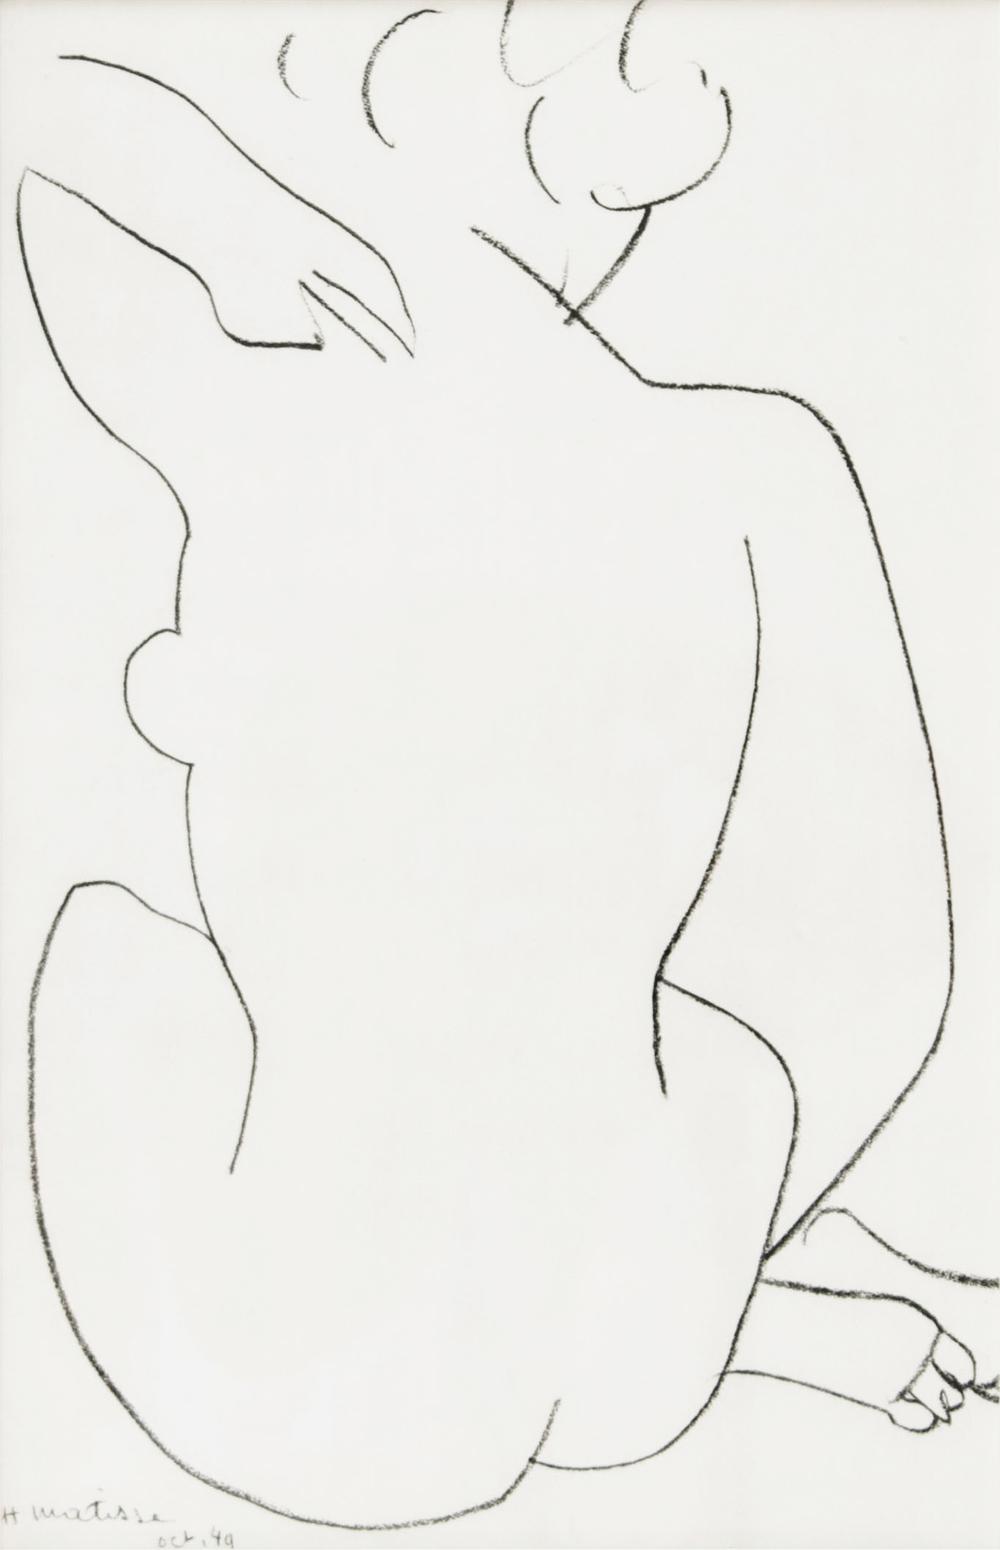 Henri-Matisse-cutouts-drawing-torso-back-unframed.jpg